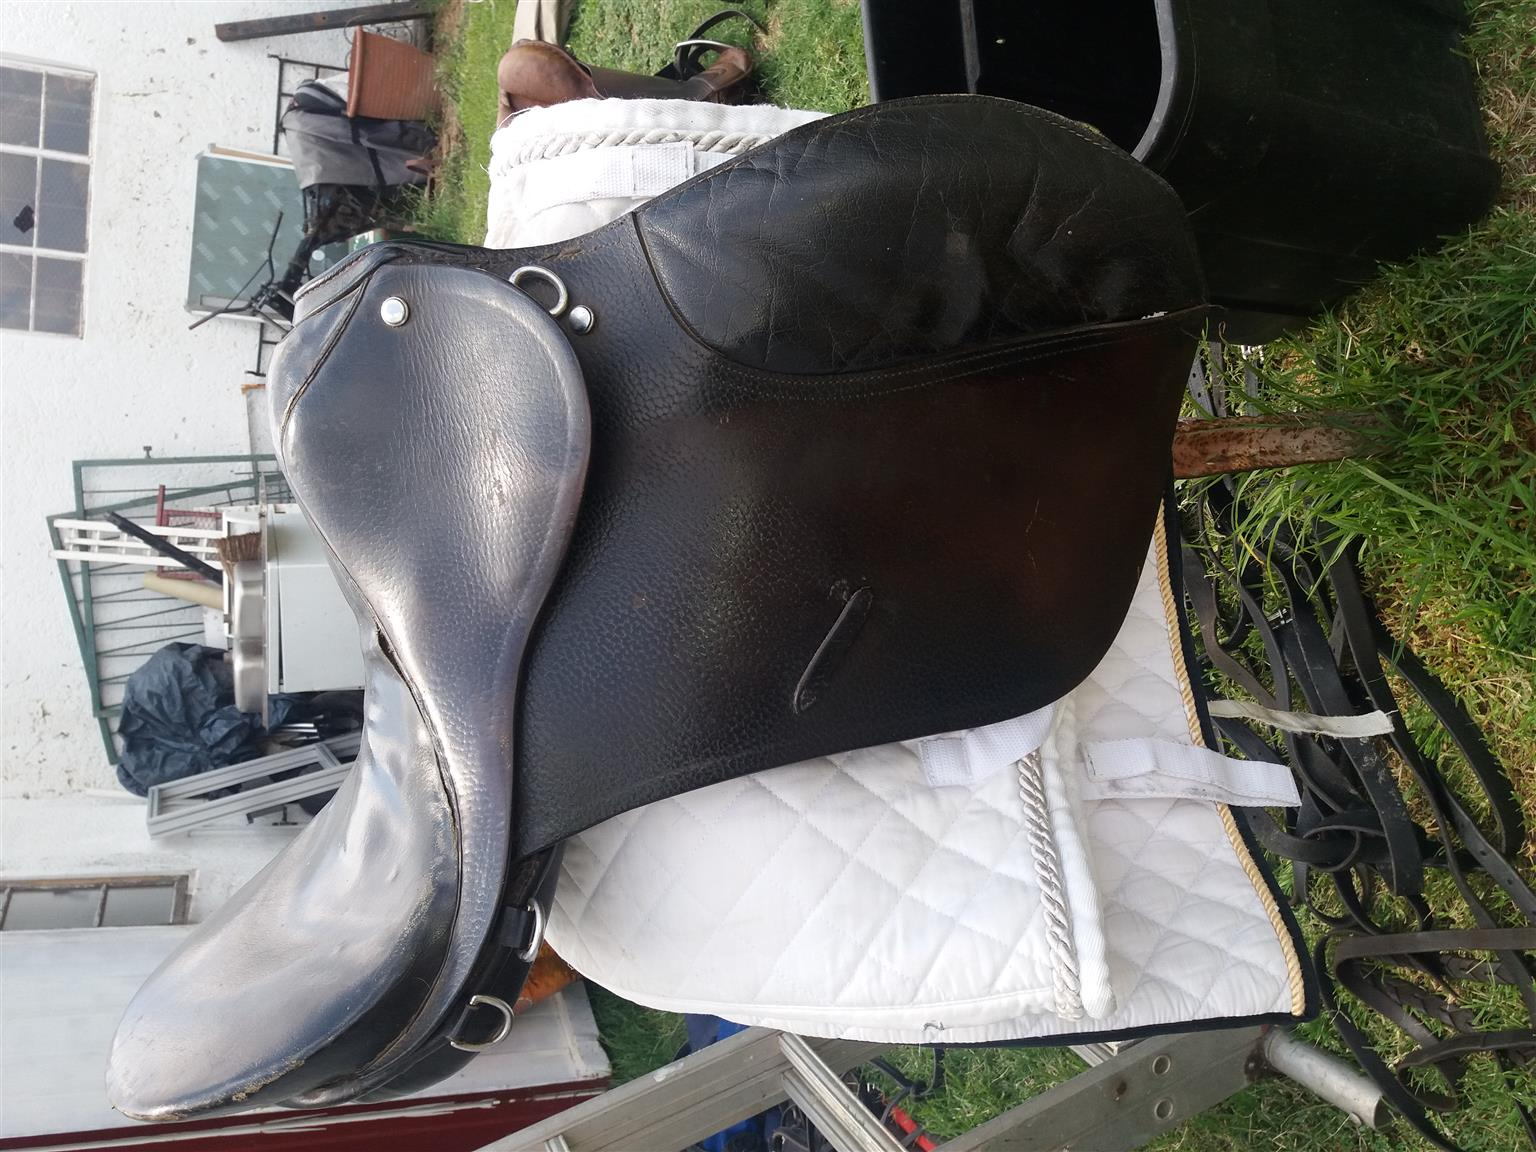 Ascott gp saddle